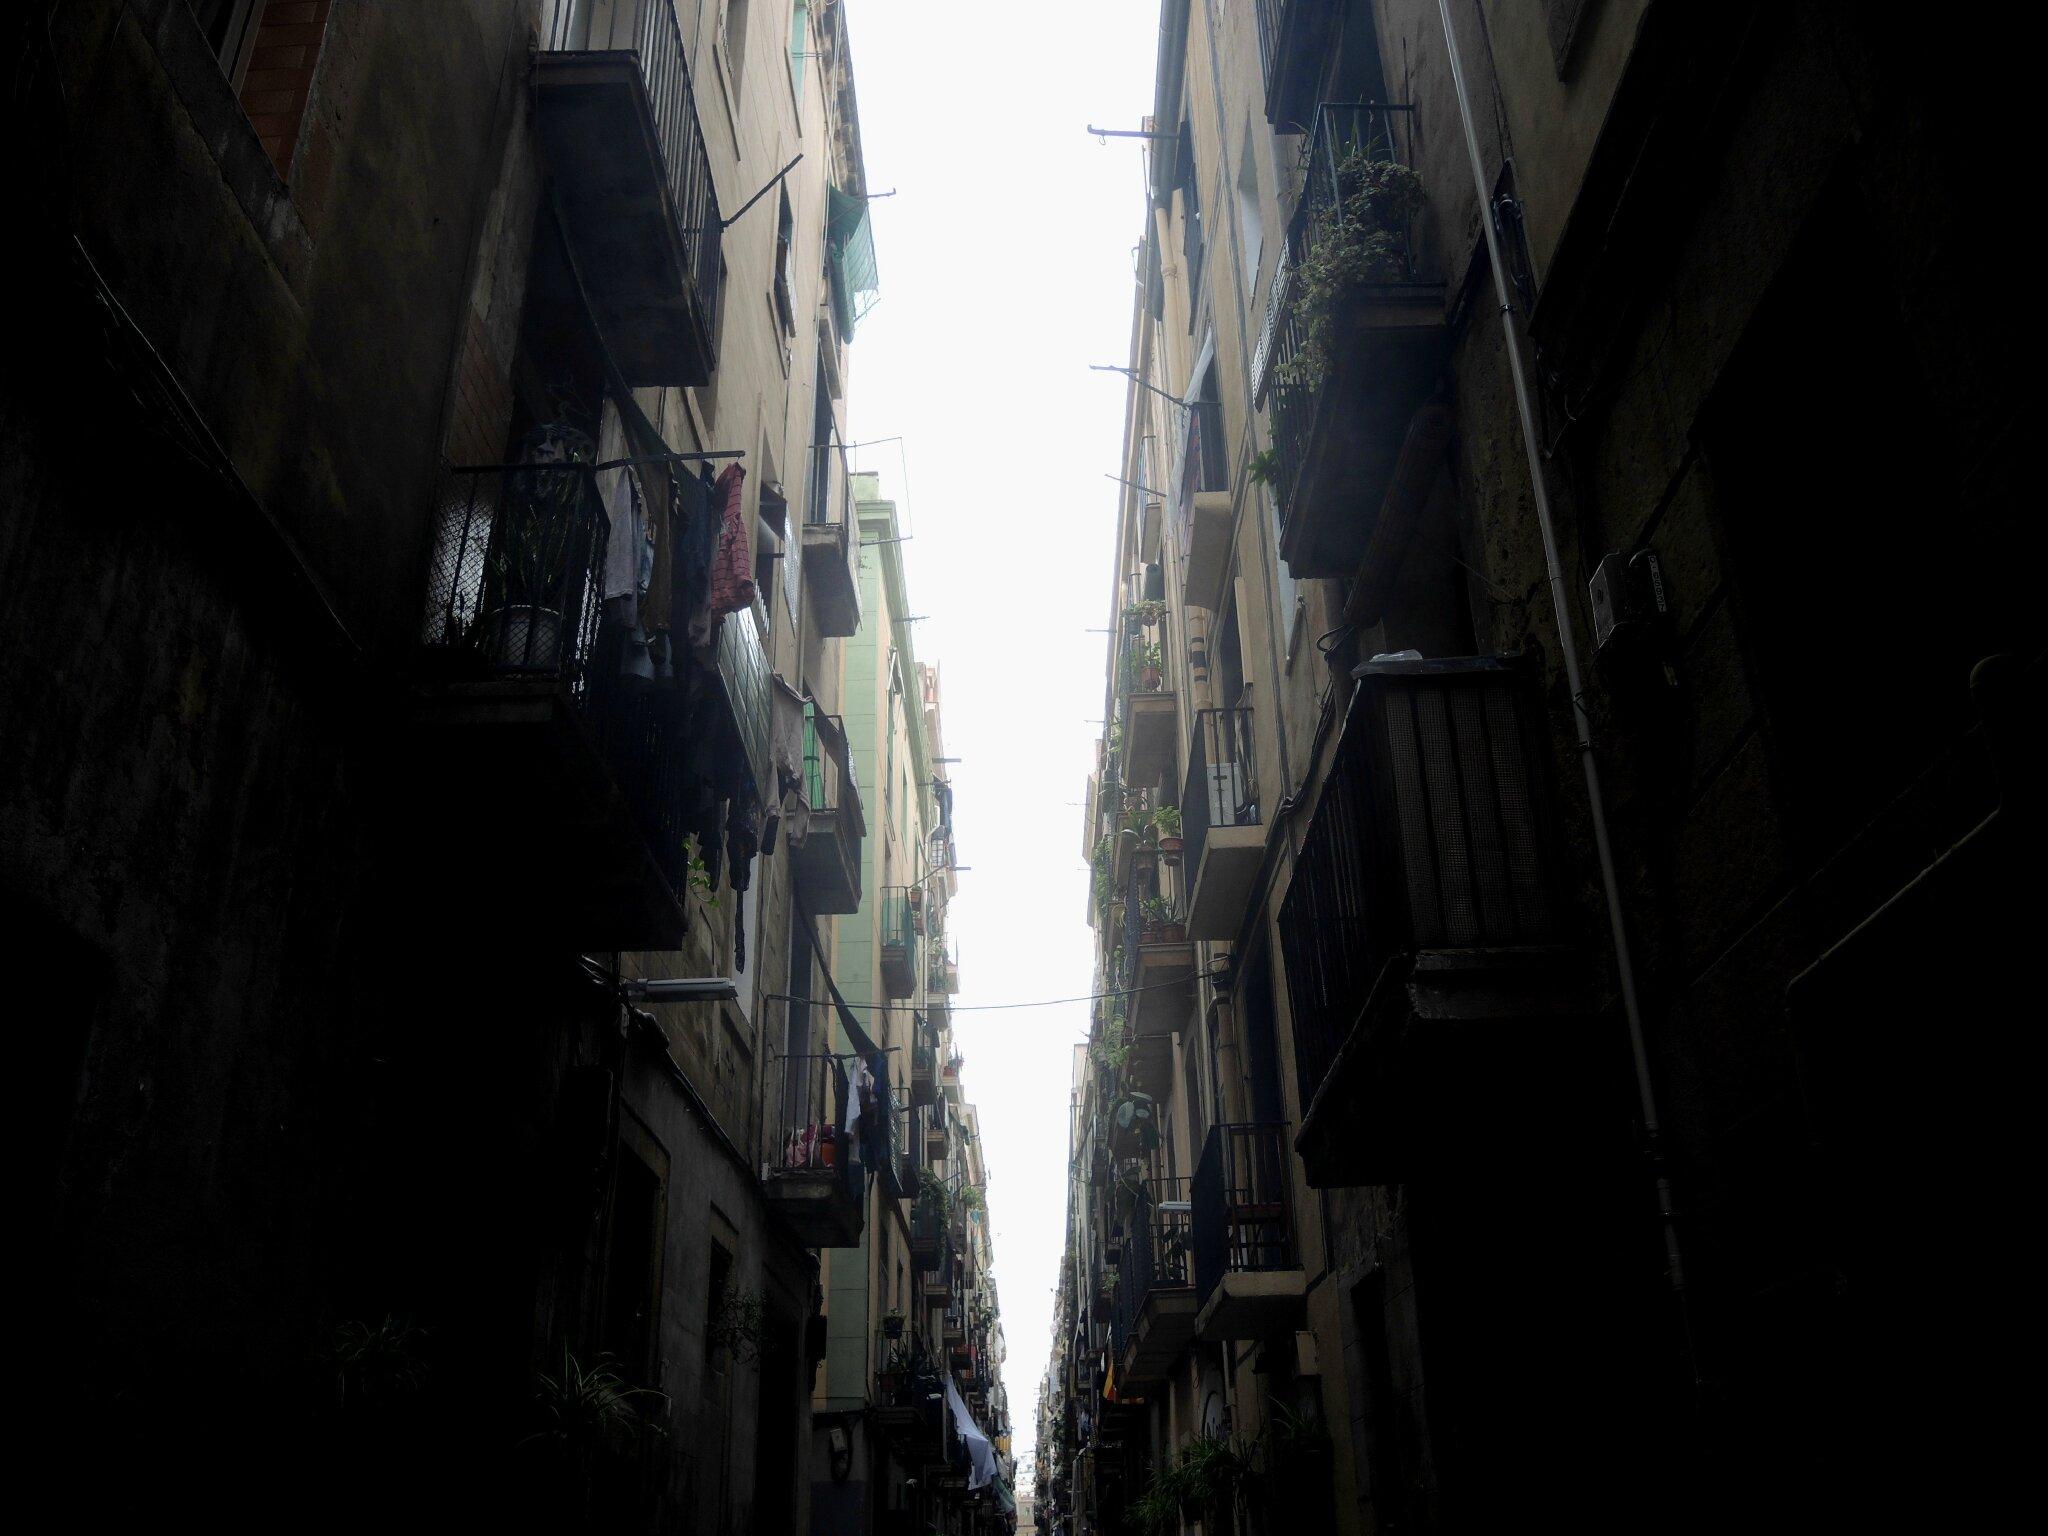 Barcelone, quartier gothique, ruelle (Espagne)